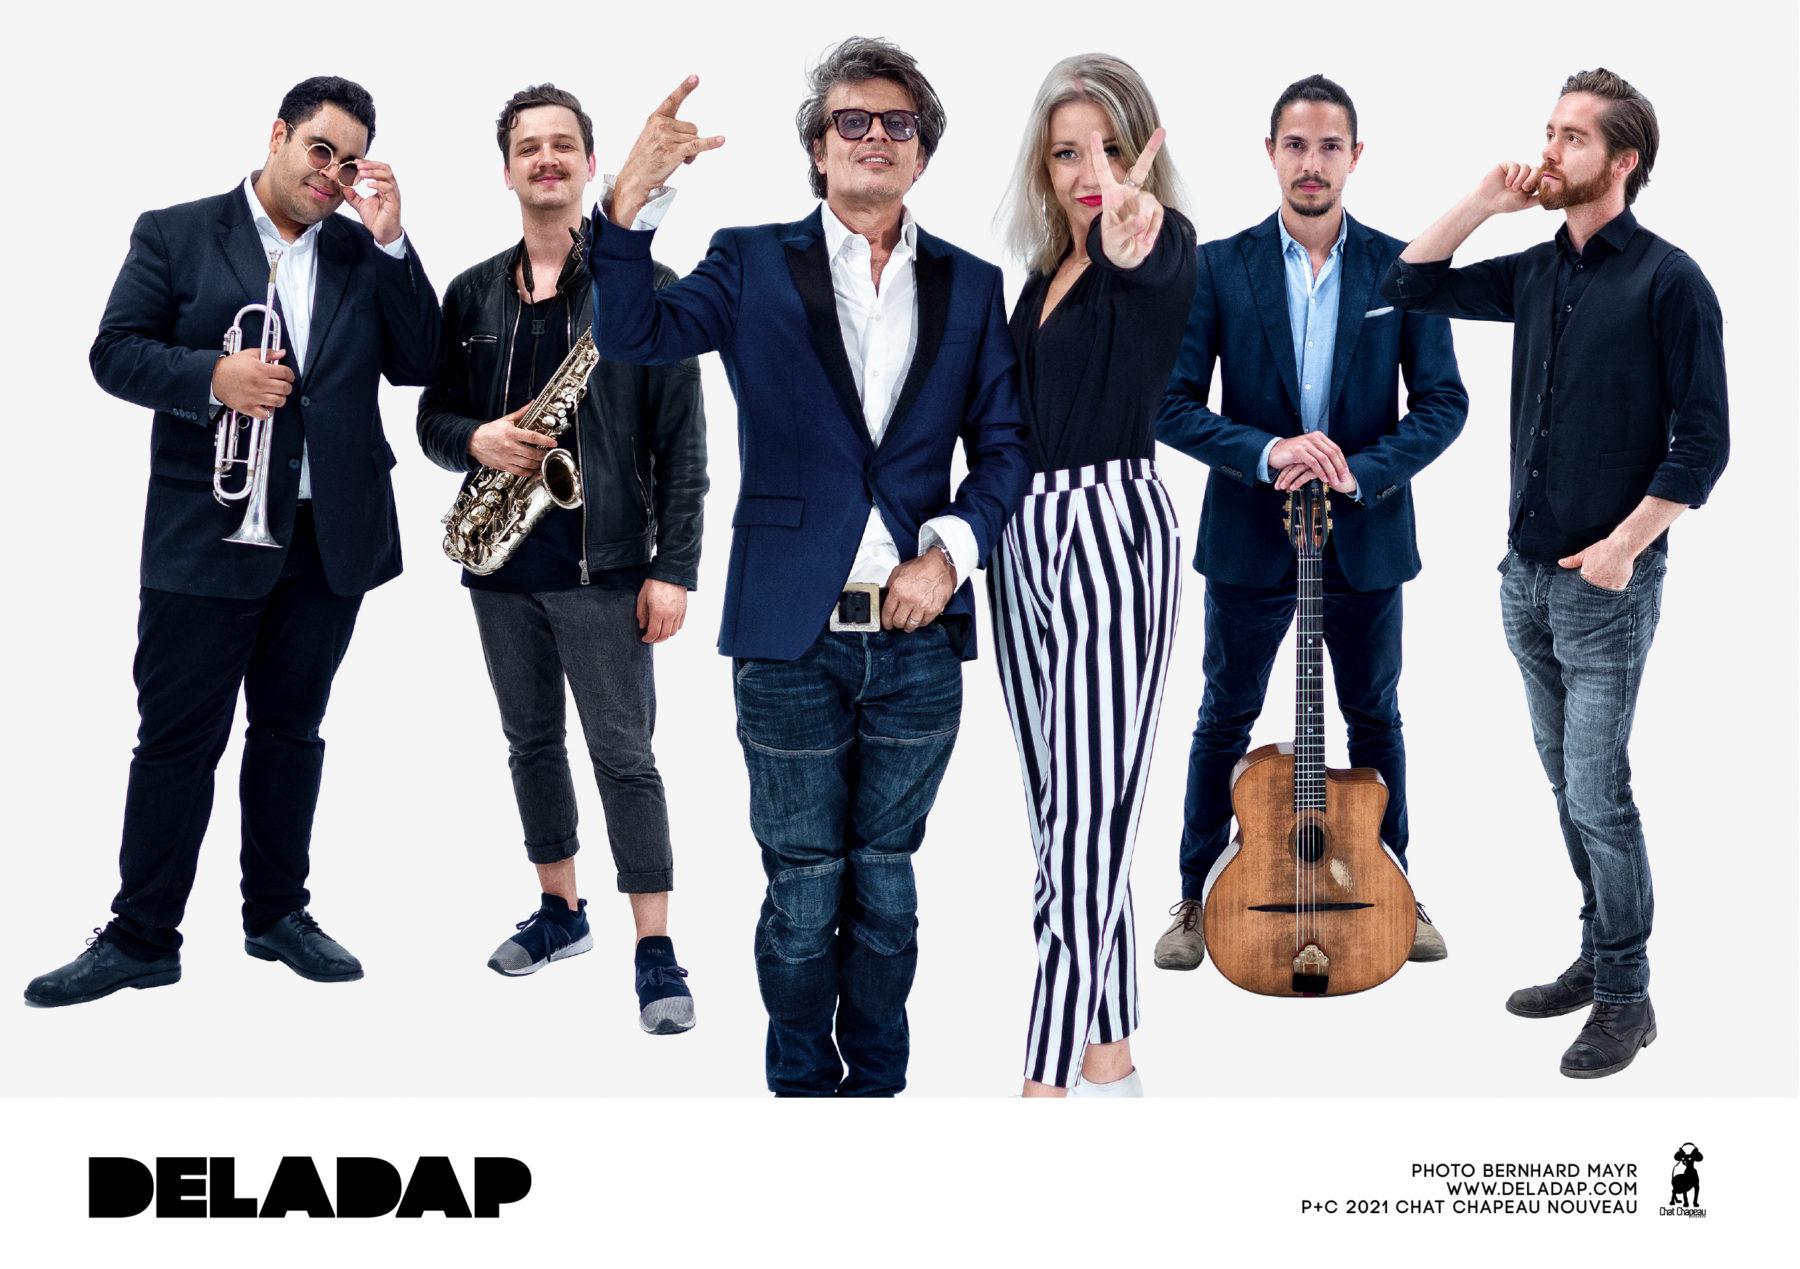 Deladap Fotó: Bernhard_Mayr/Paloznaki Jazzpiknik hivatalos